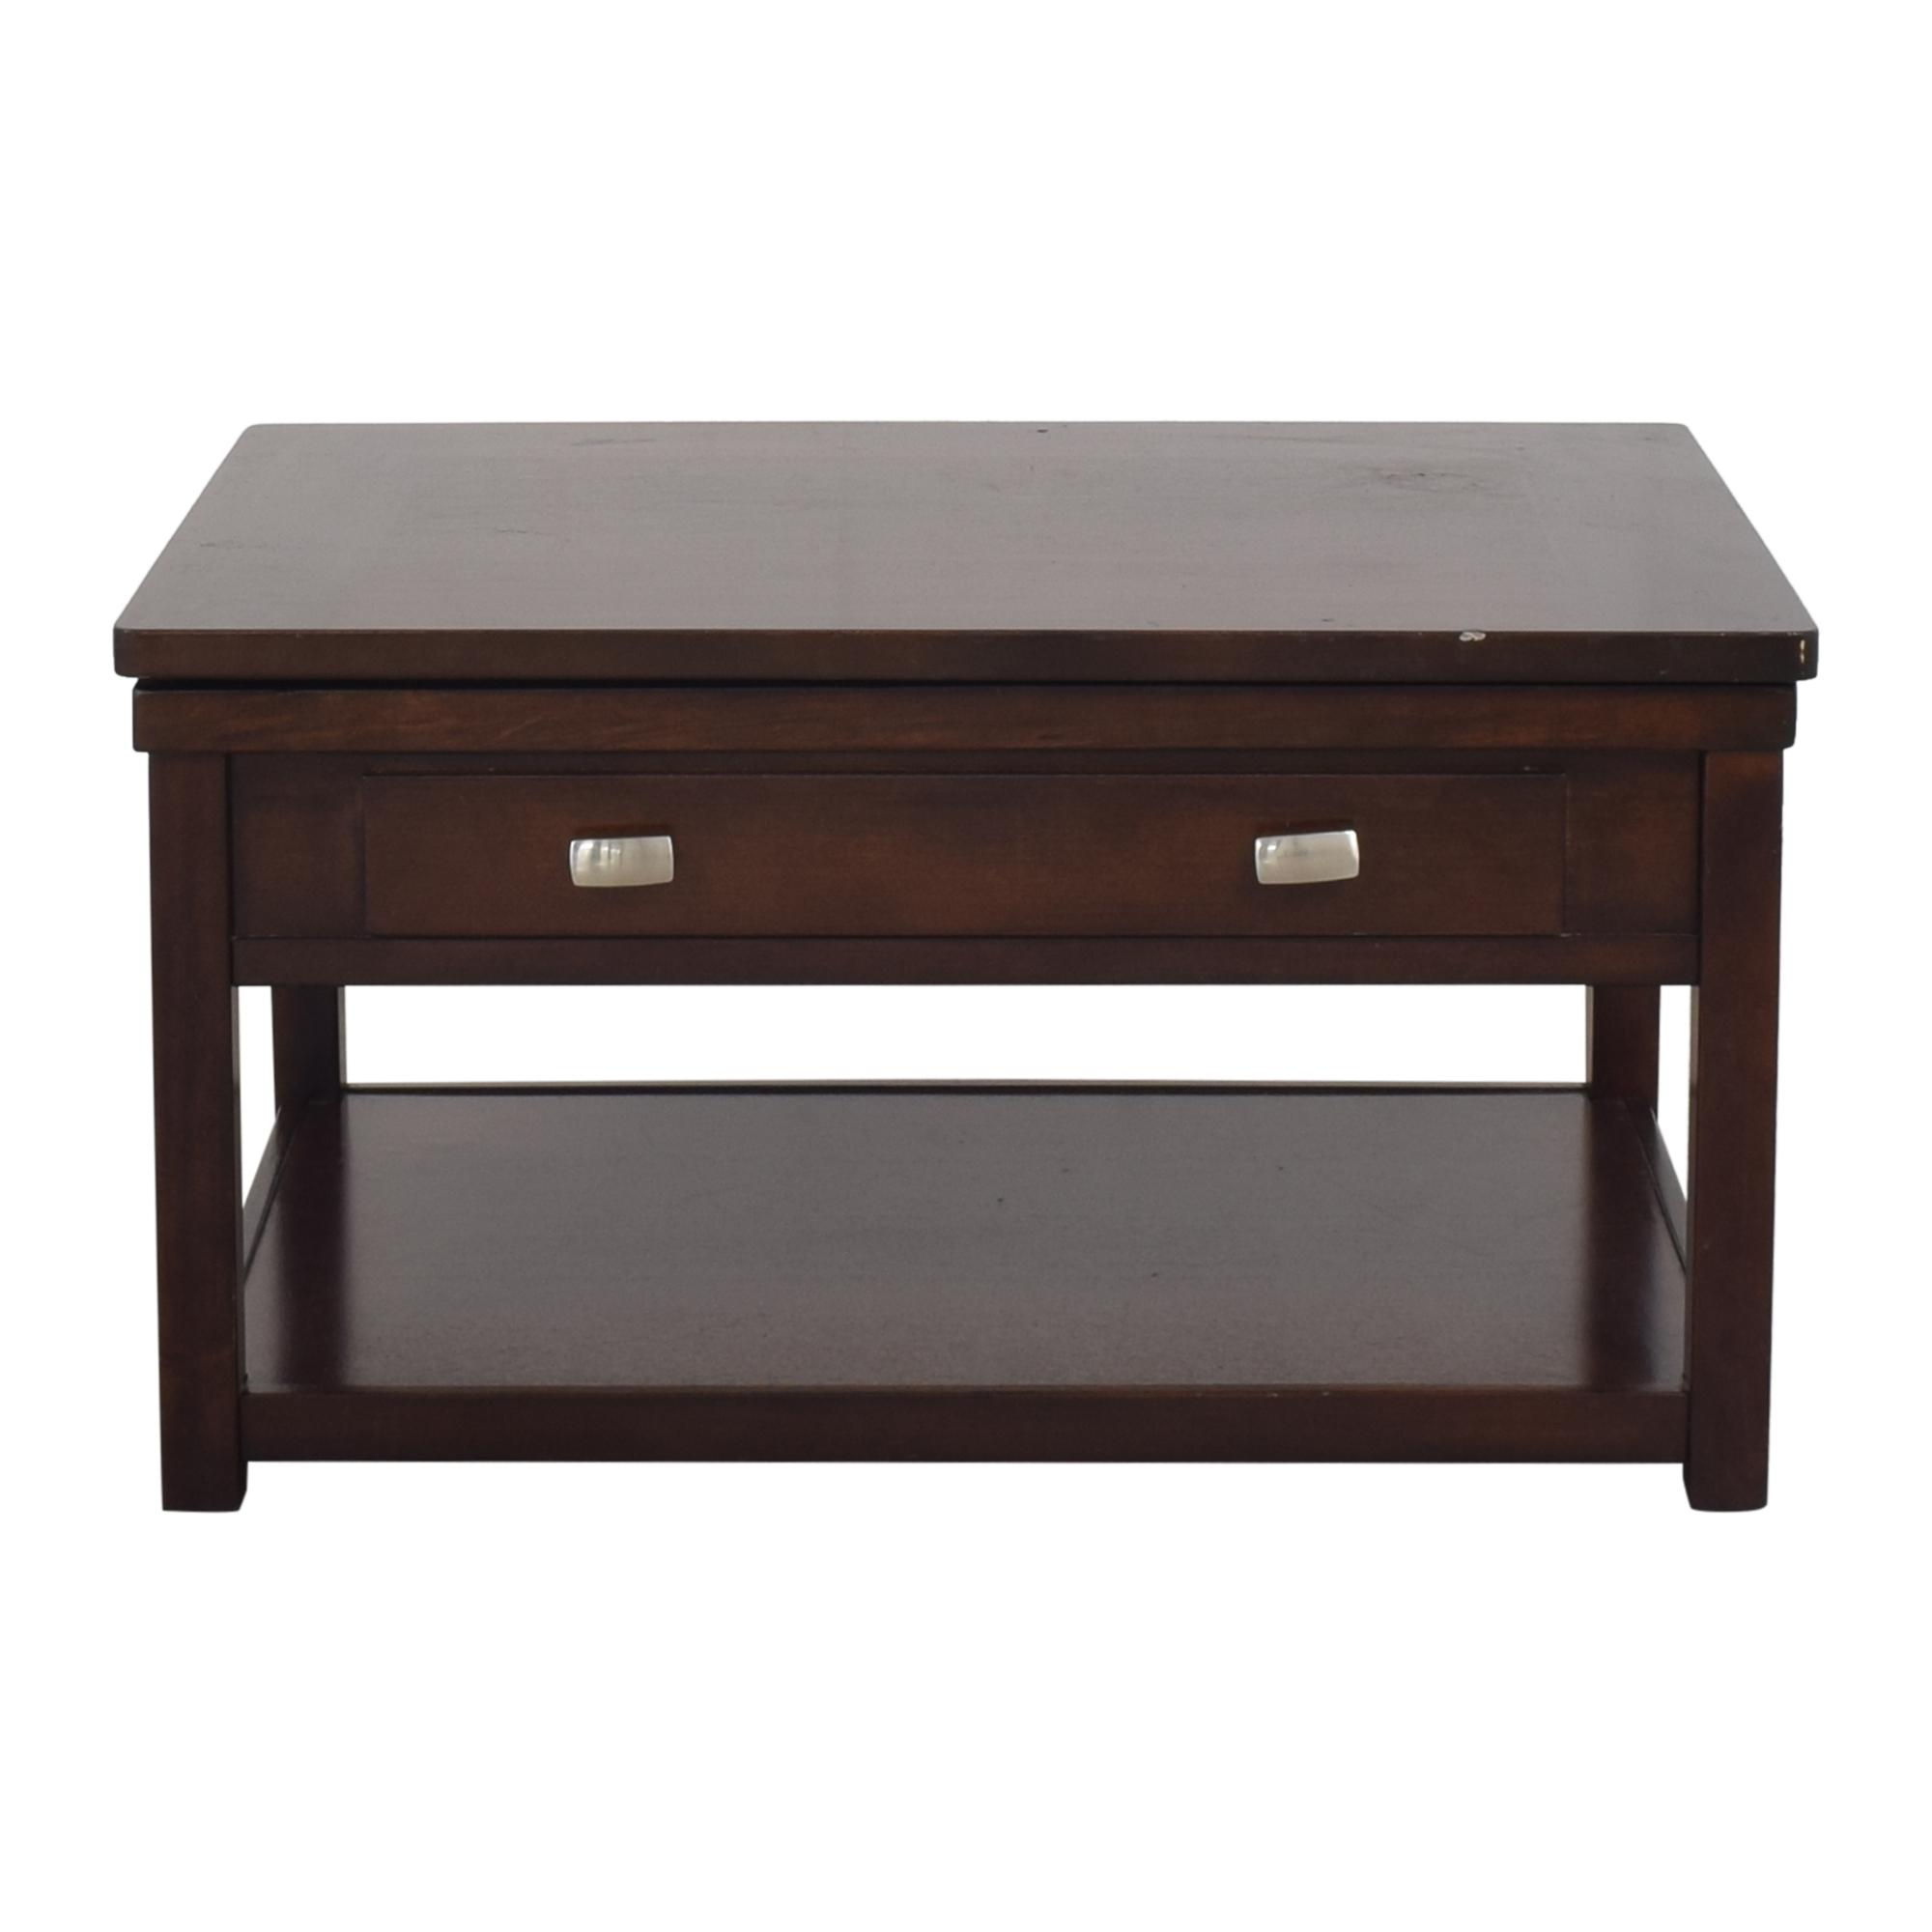 Ashley Furniture Ashley Furniture Hatsuko Lift Top Cocktail Table dark brown